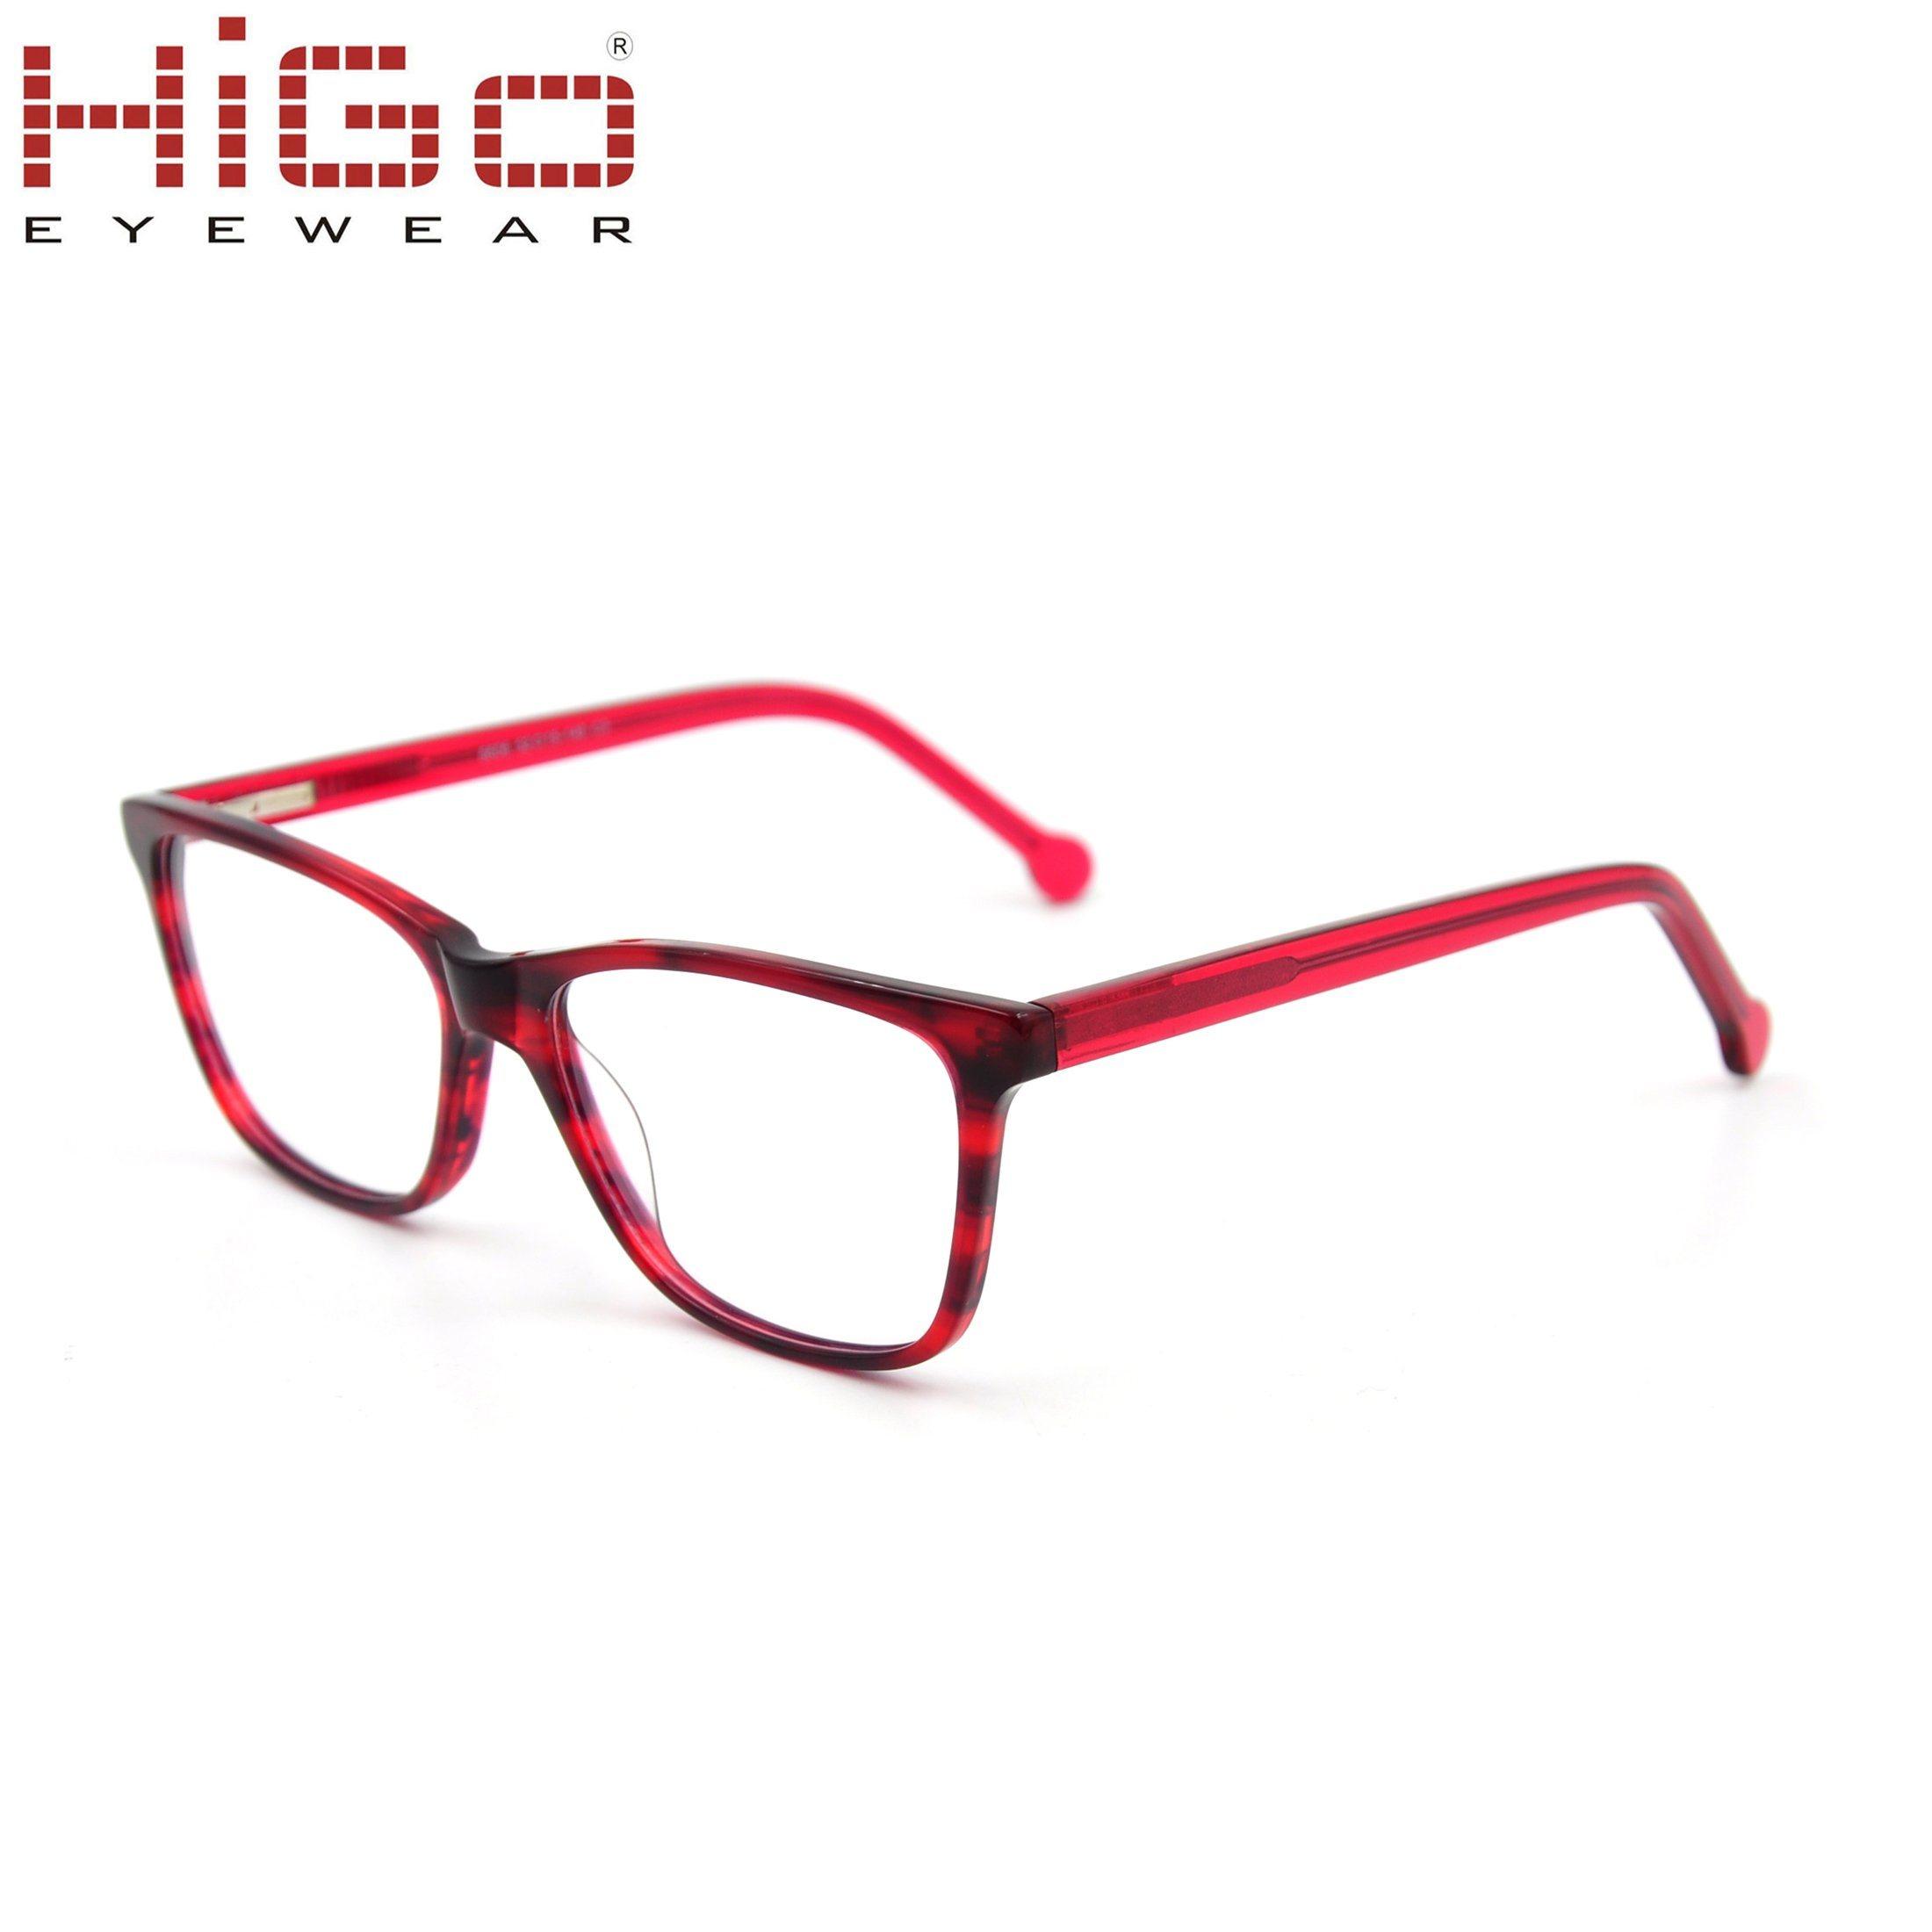 ba578cb4ff China New Model Acetate Glasses Eyeglass Frame Eyewear Frame Photos ...